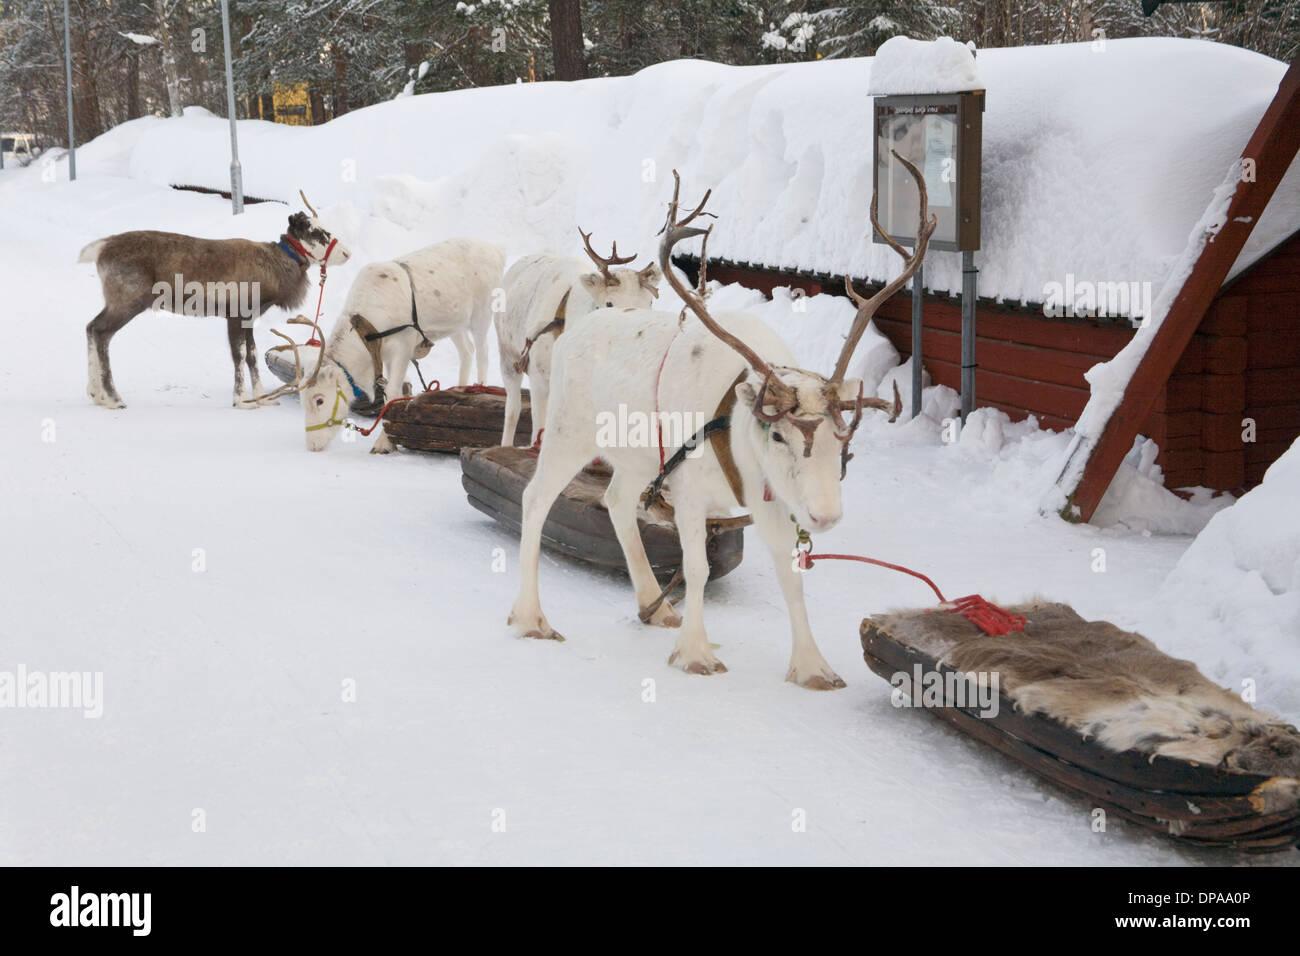 Reindeer caravan Rangifer tarandus Laplander culture Jokkmokk fair Laponia Sweden - Stock Image